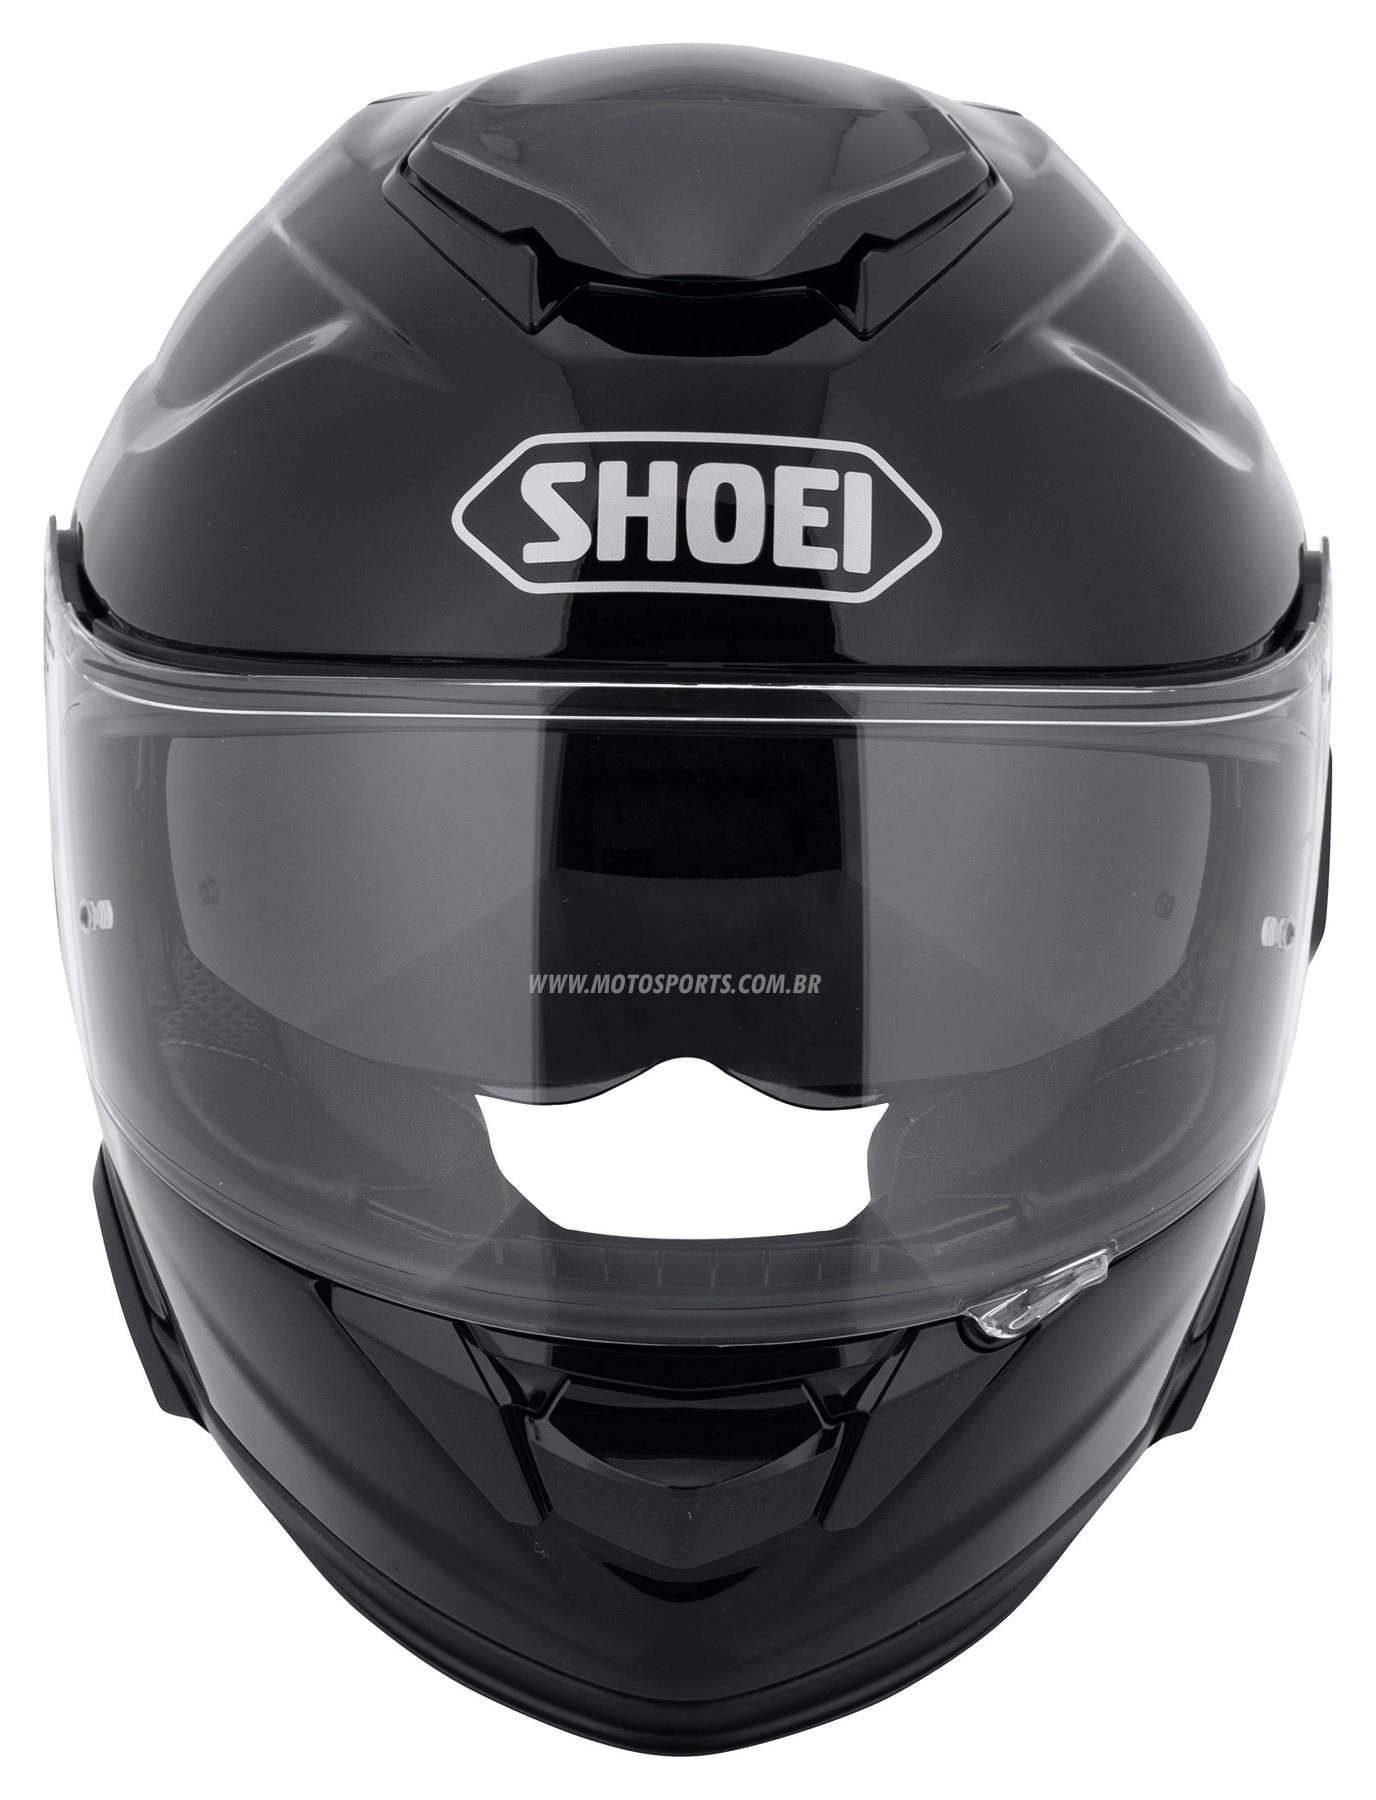 CAPACETE SHOEI GT-AIR 2 PRETO   - Motosports